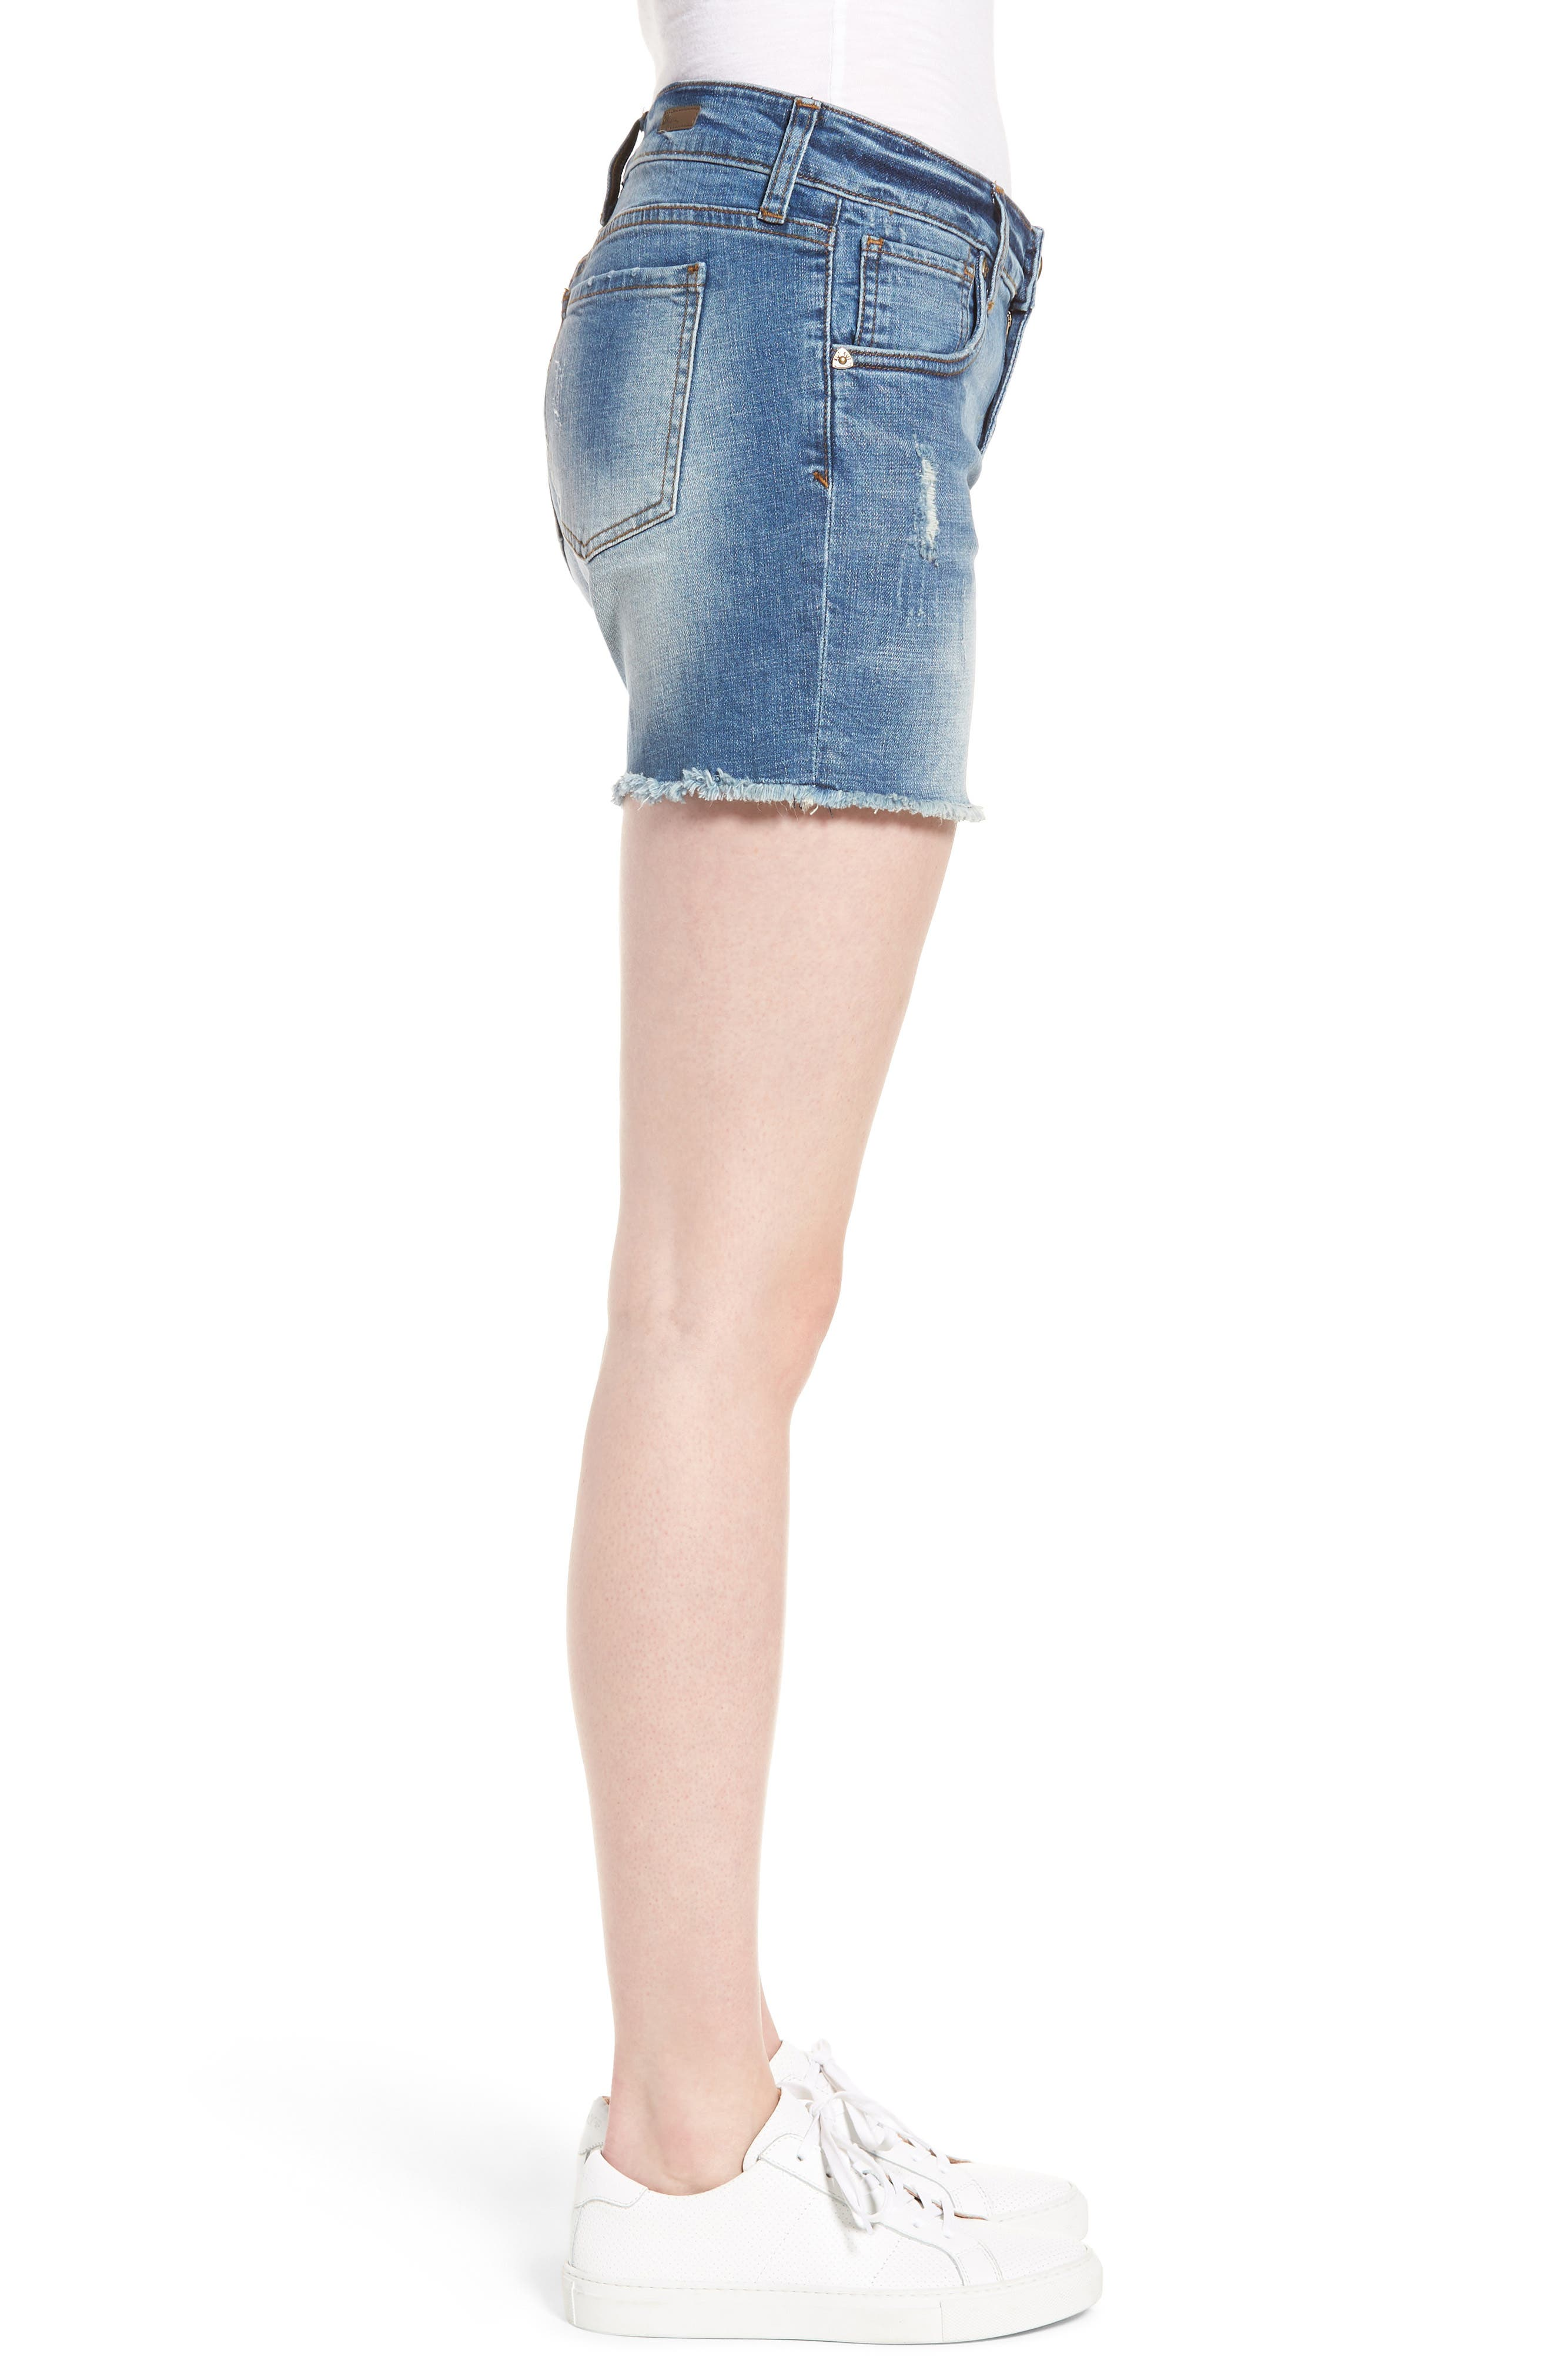 Gidget Distressed Denim Shorts,                             Alternate thumbnail 3, color,                             475